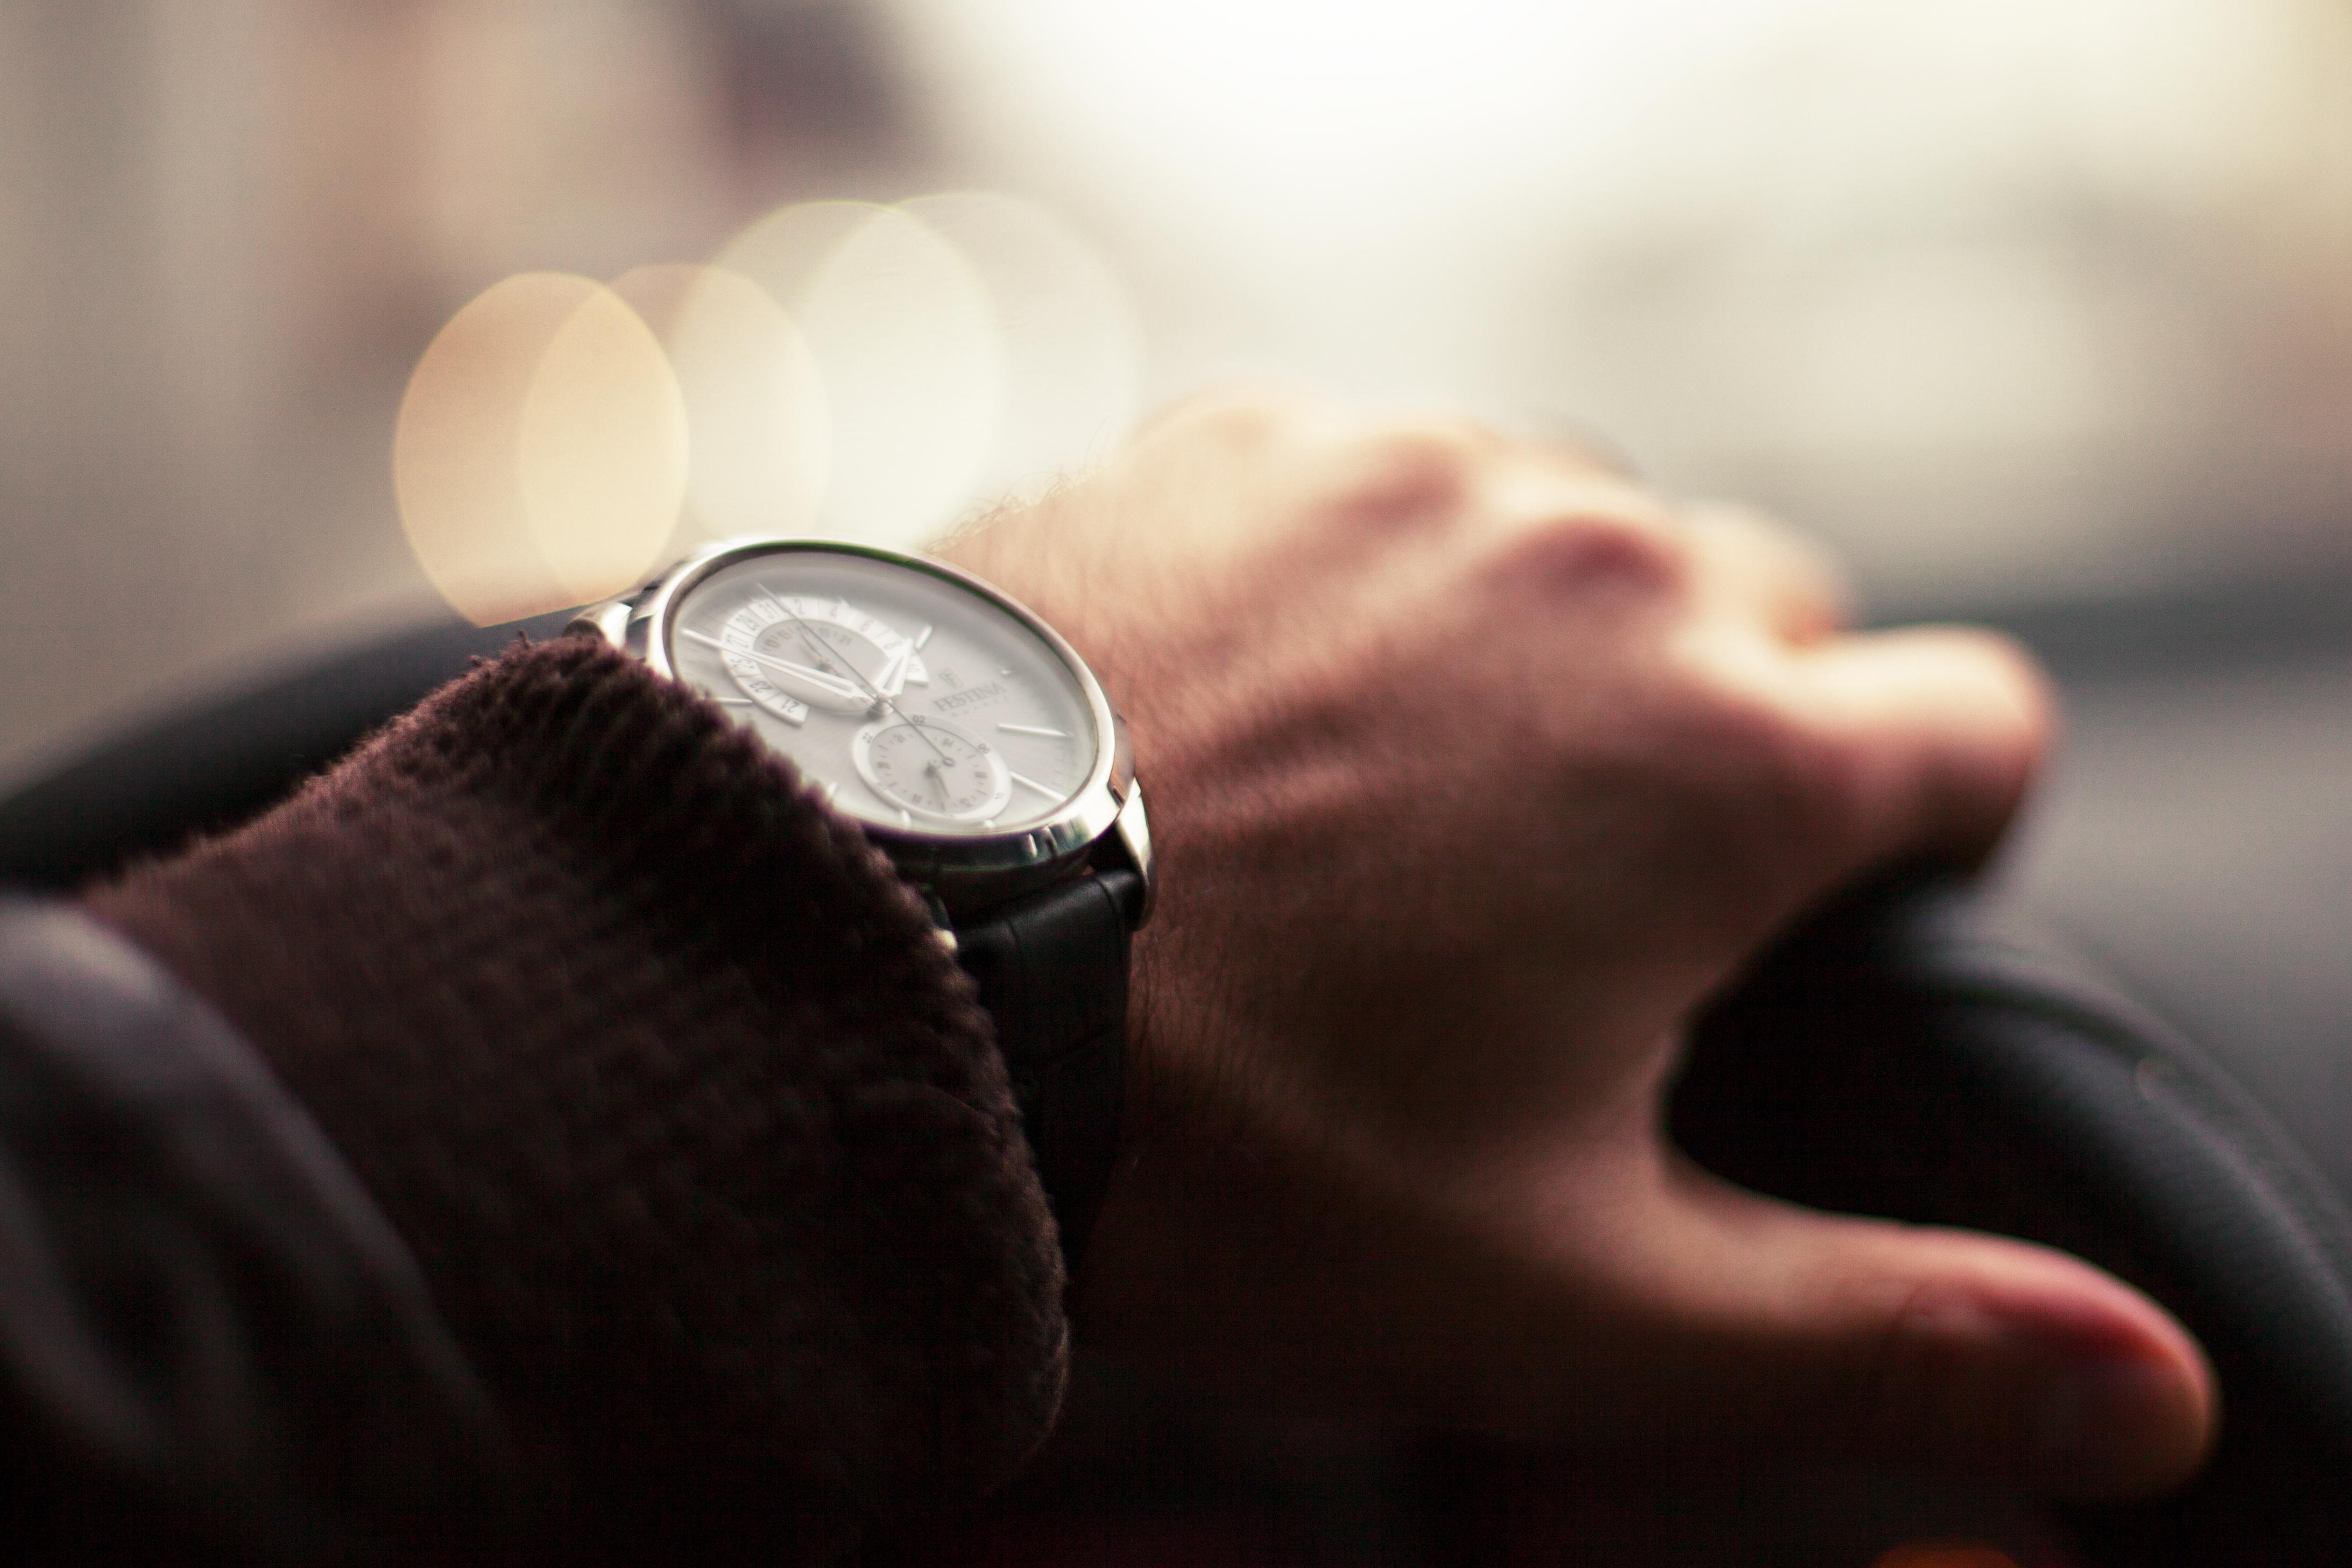 27364b8a92230 هل تفكر في شراء ساعة يد أنيقة؟ اتبع هذه النصائح